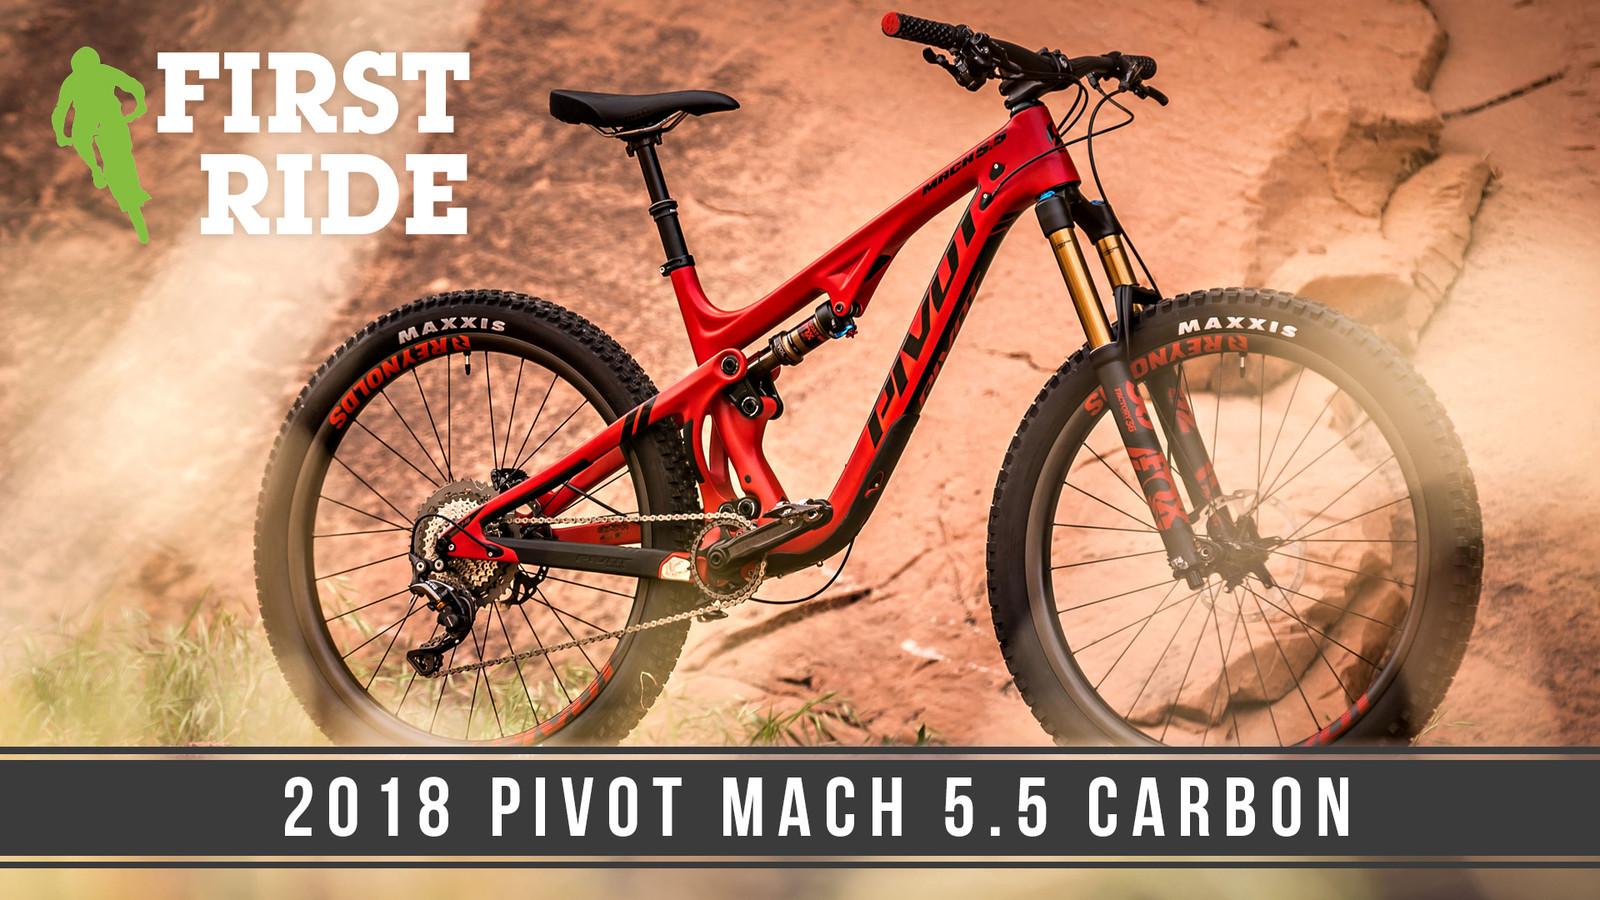 First Ride: 2018 Pivot Mach 5.5 Carbon – A Ripping Next-Gen Trail Bike